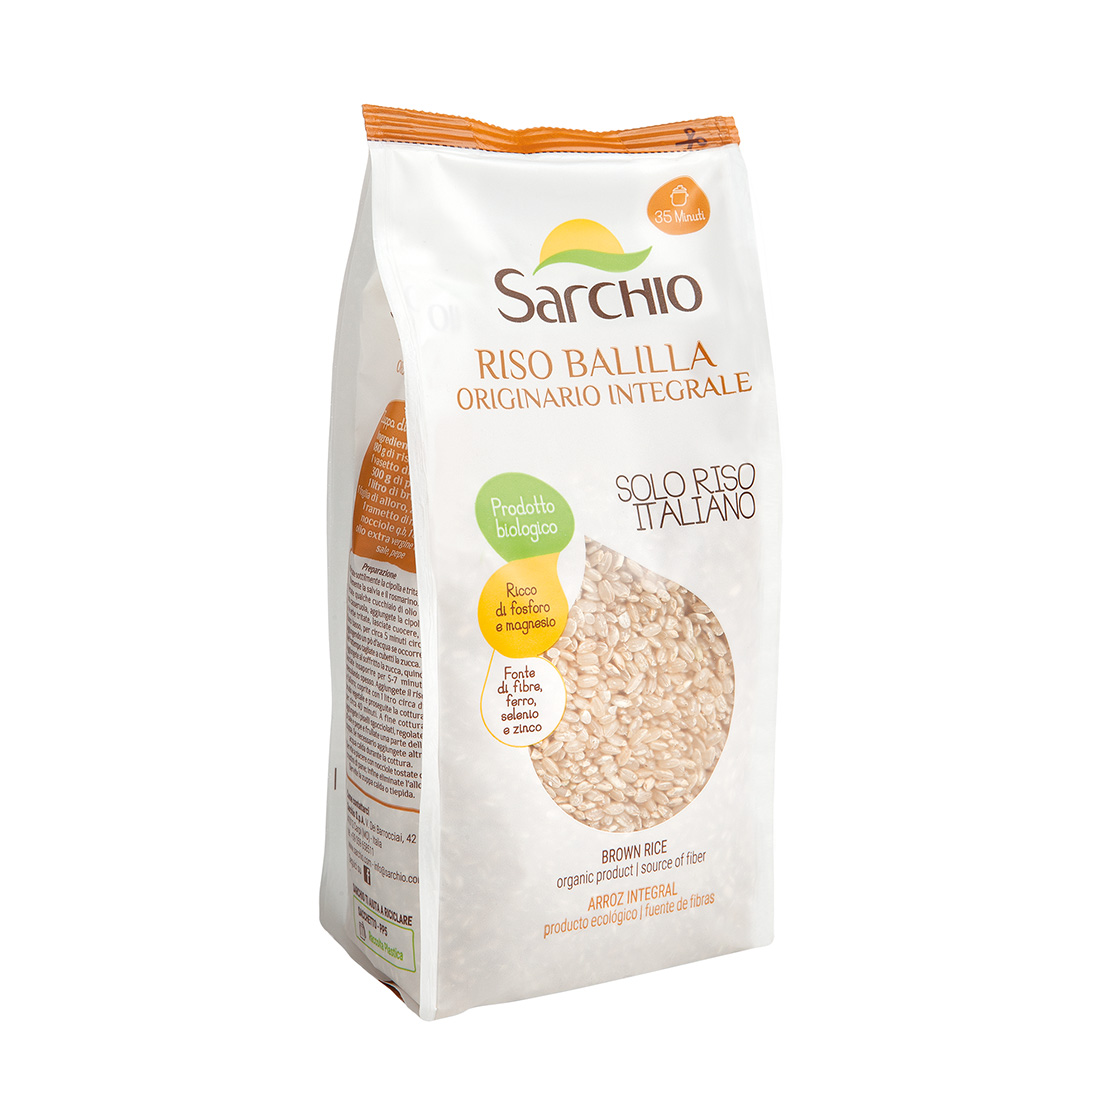 Brown Balilla rice